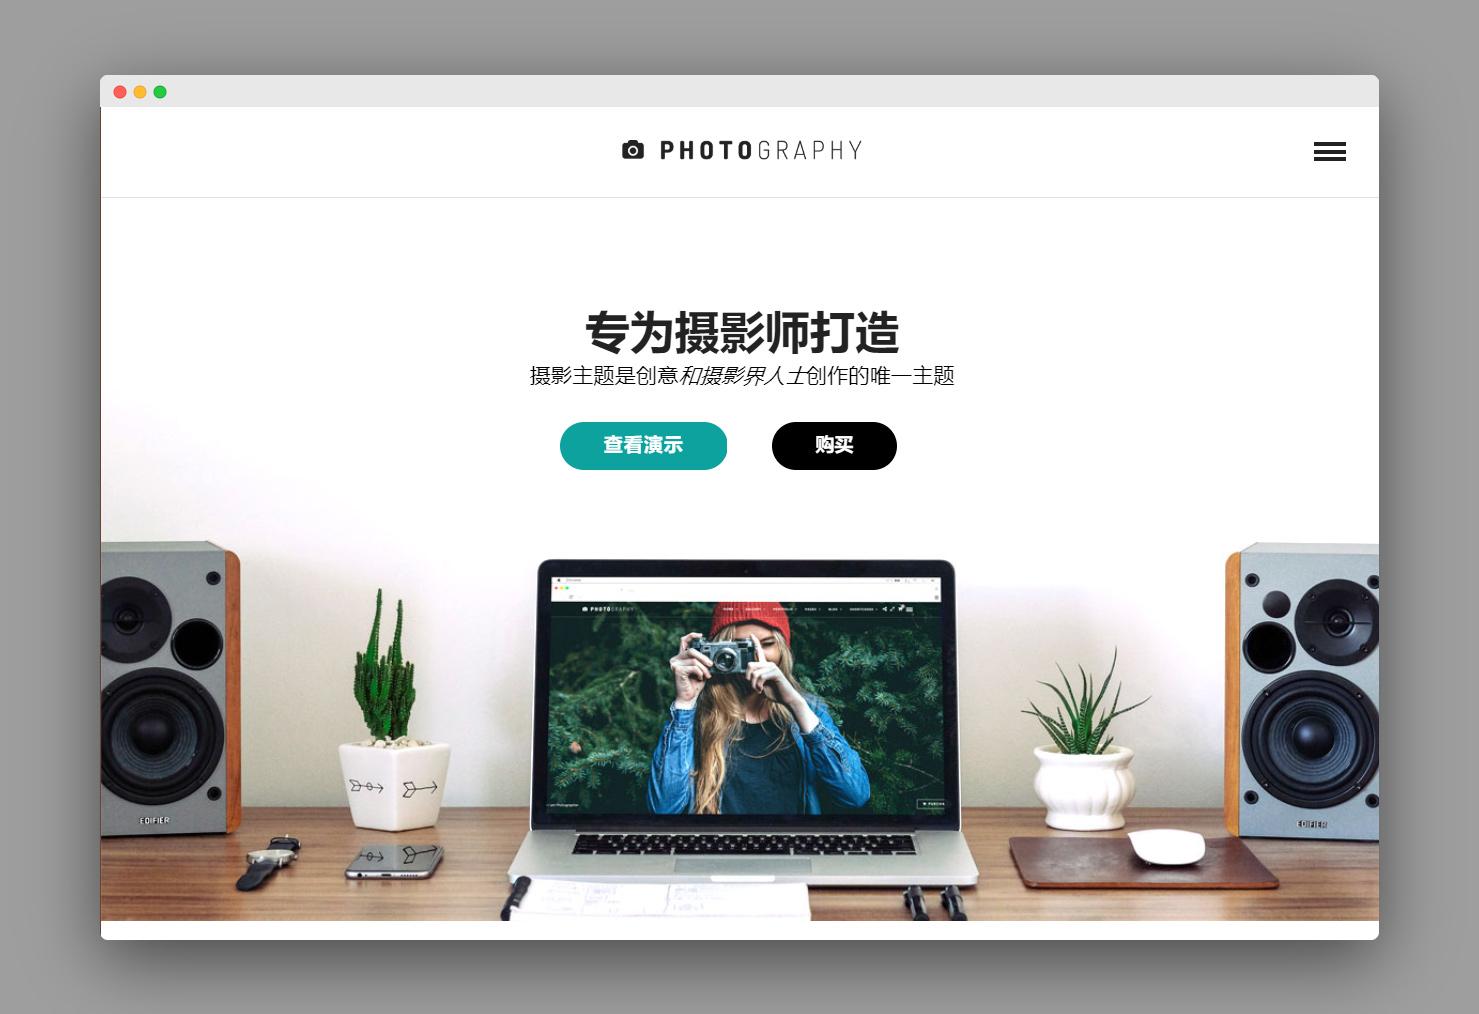 【Photography v6.4.1主题】WordPress多功能响应式摄影相册网站模板源码-找主题源码